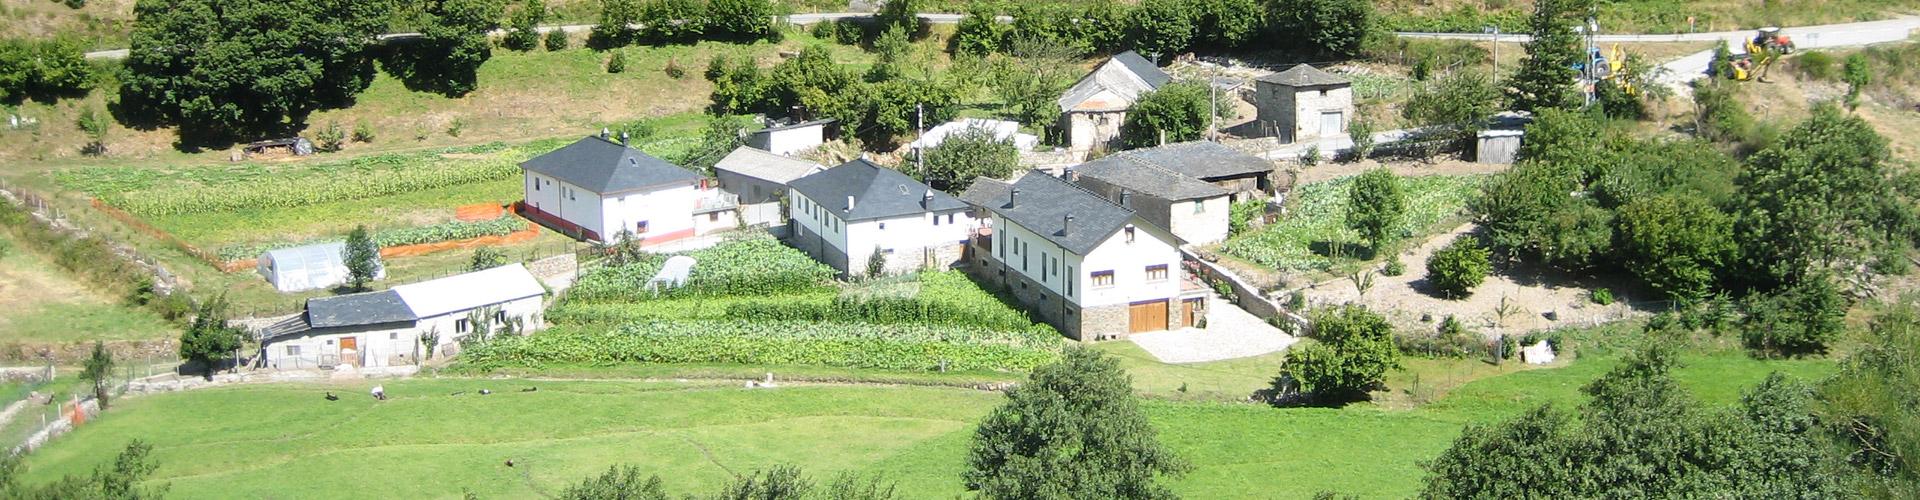 casa-martin-turismo-rural-asturias